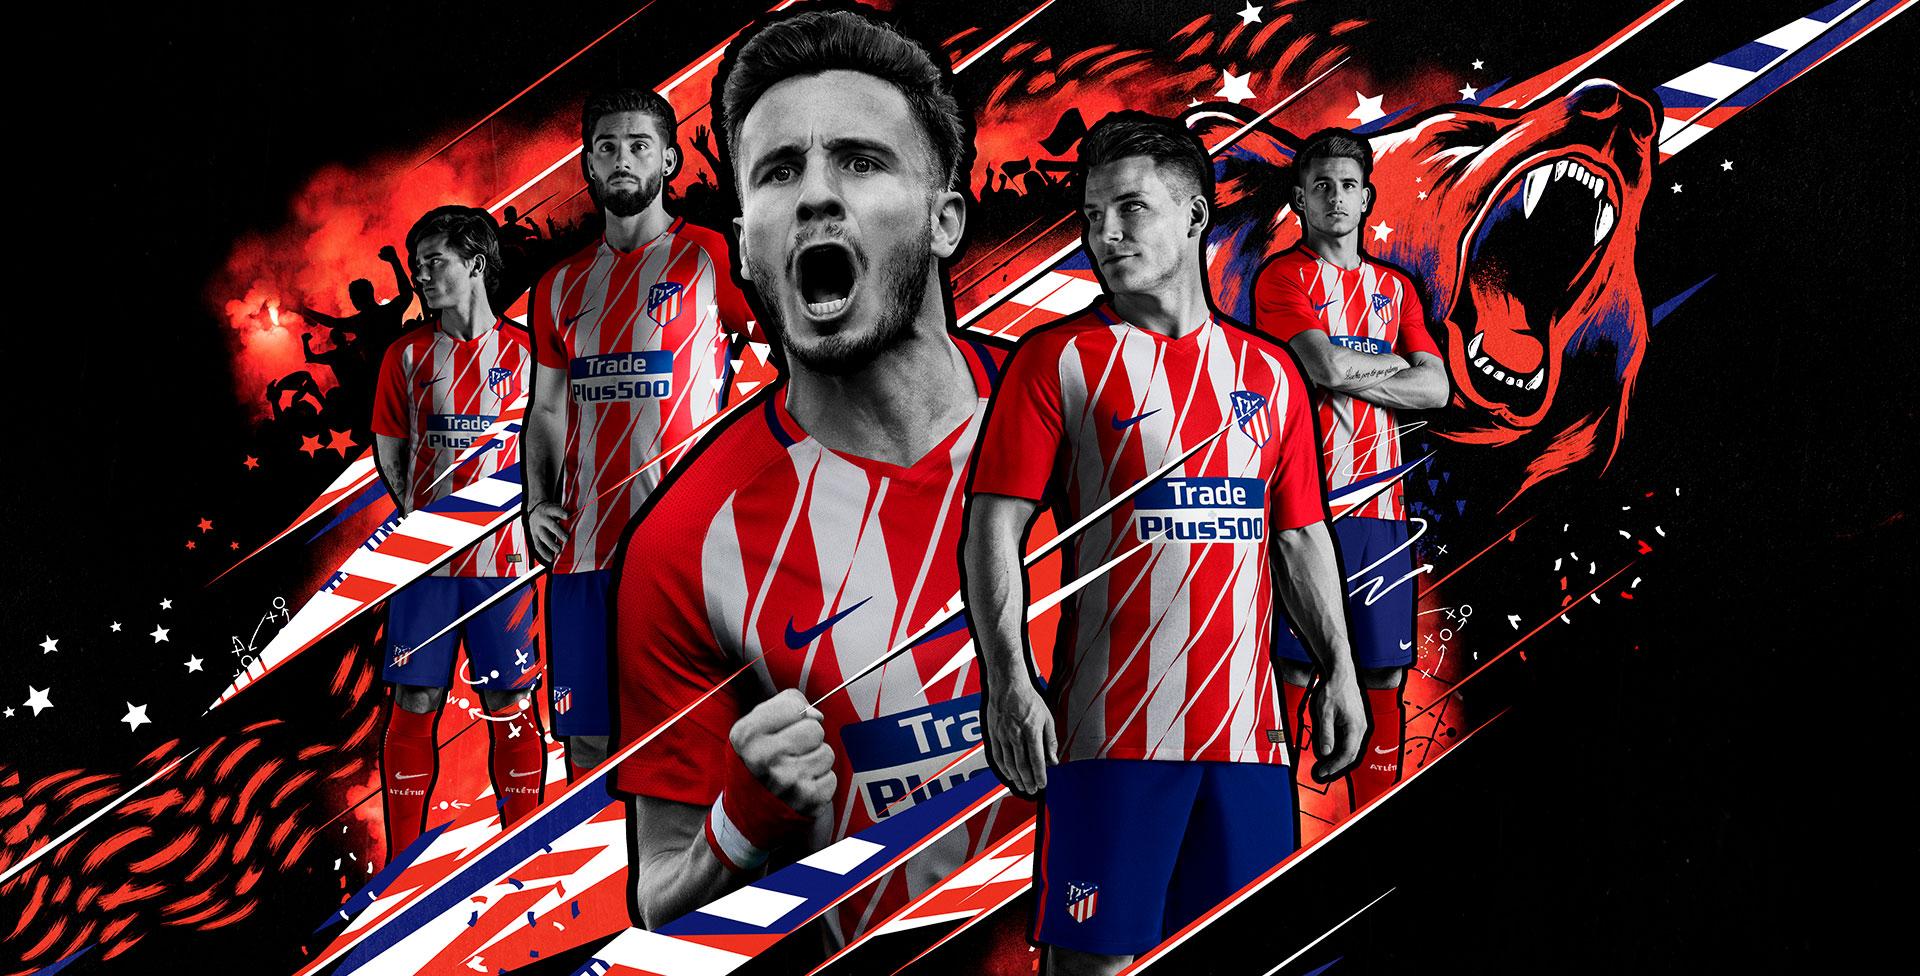 69c2bfa06 Home / News / New Nike shirts for Atletico Madrid